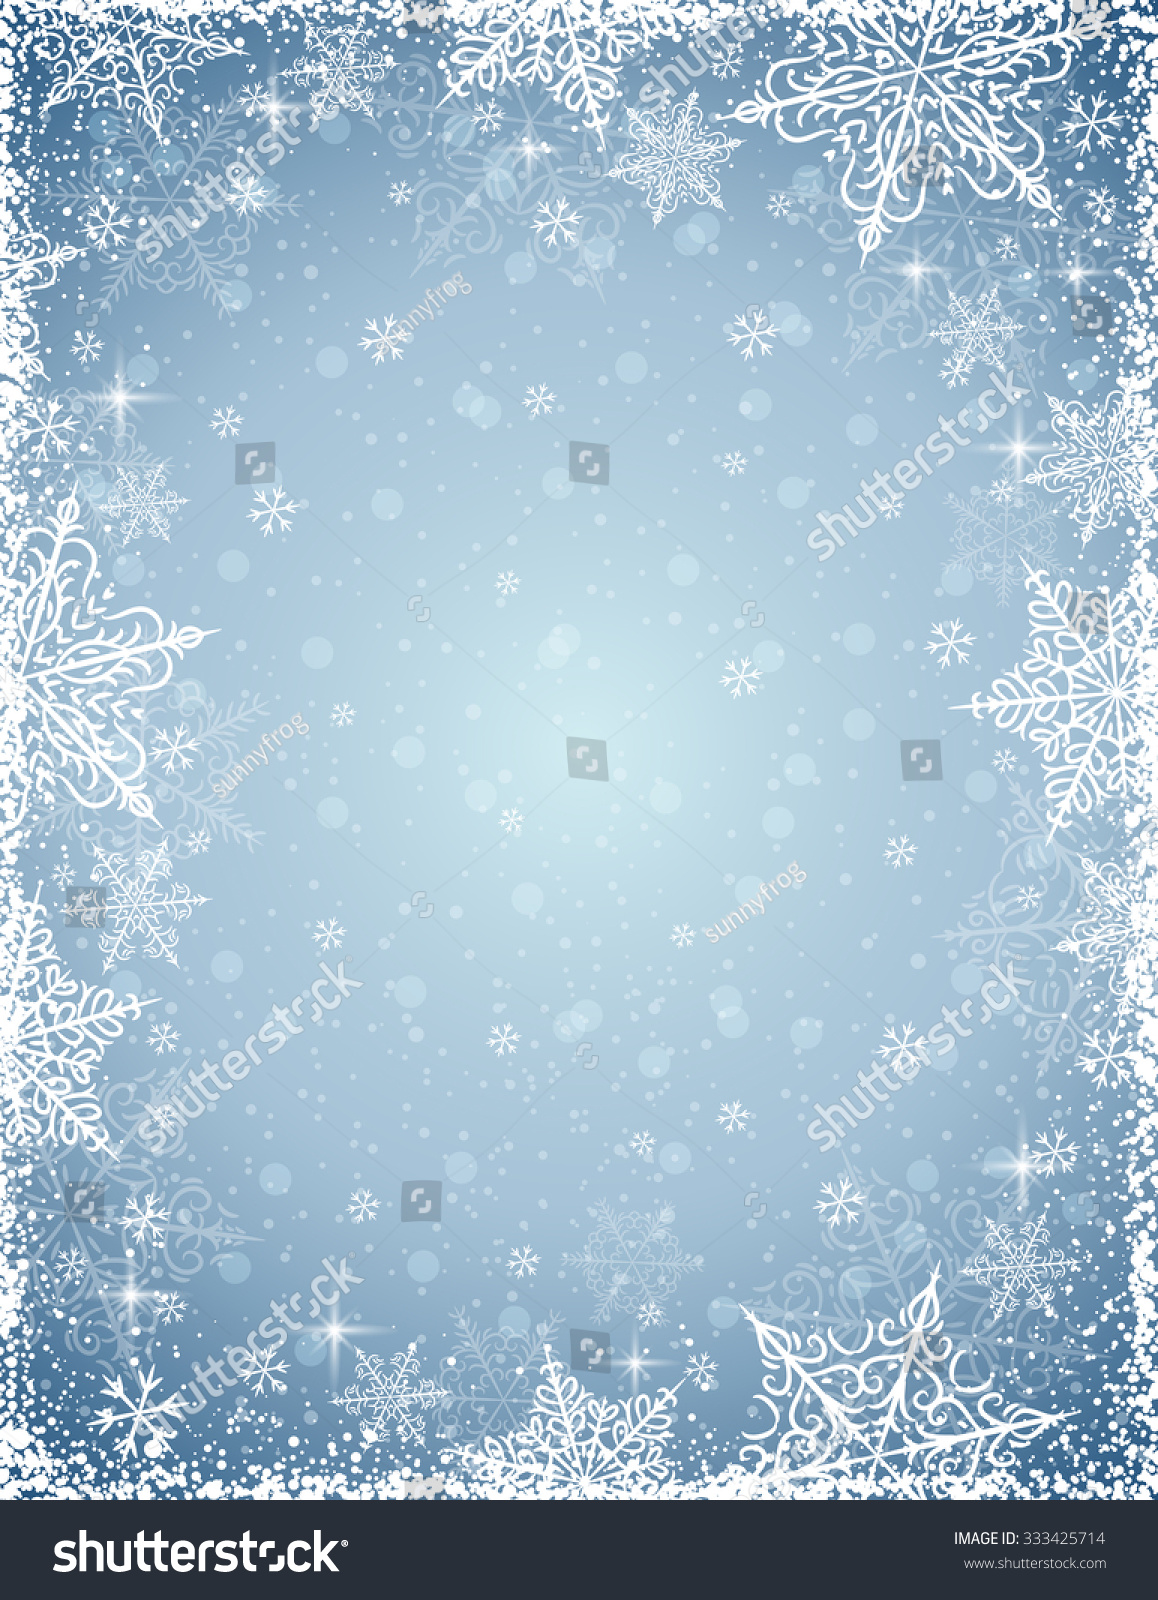 Gray snowflake vector